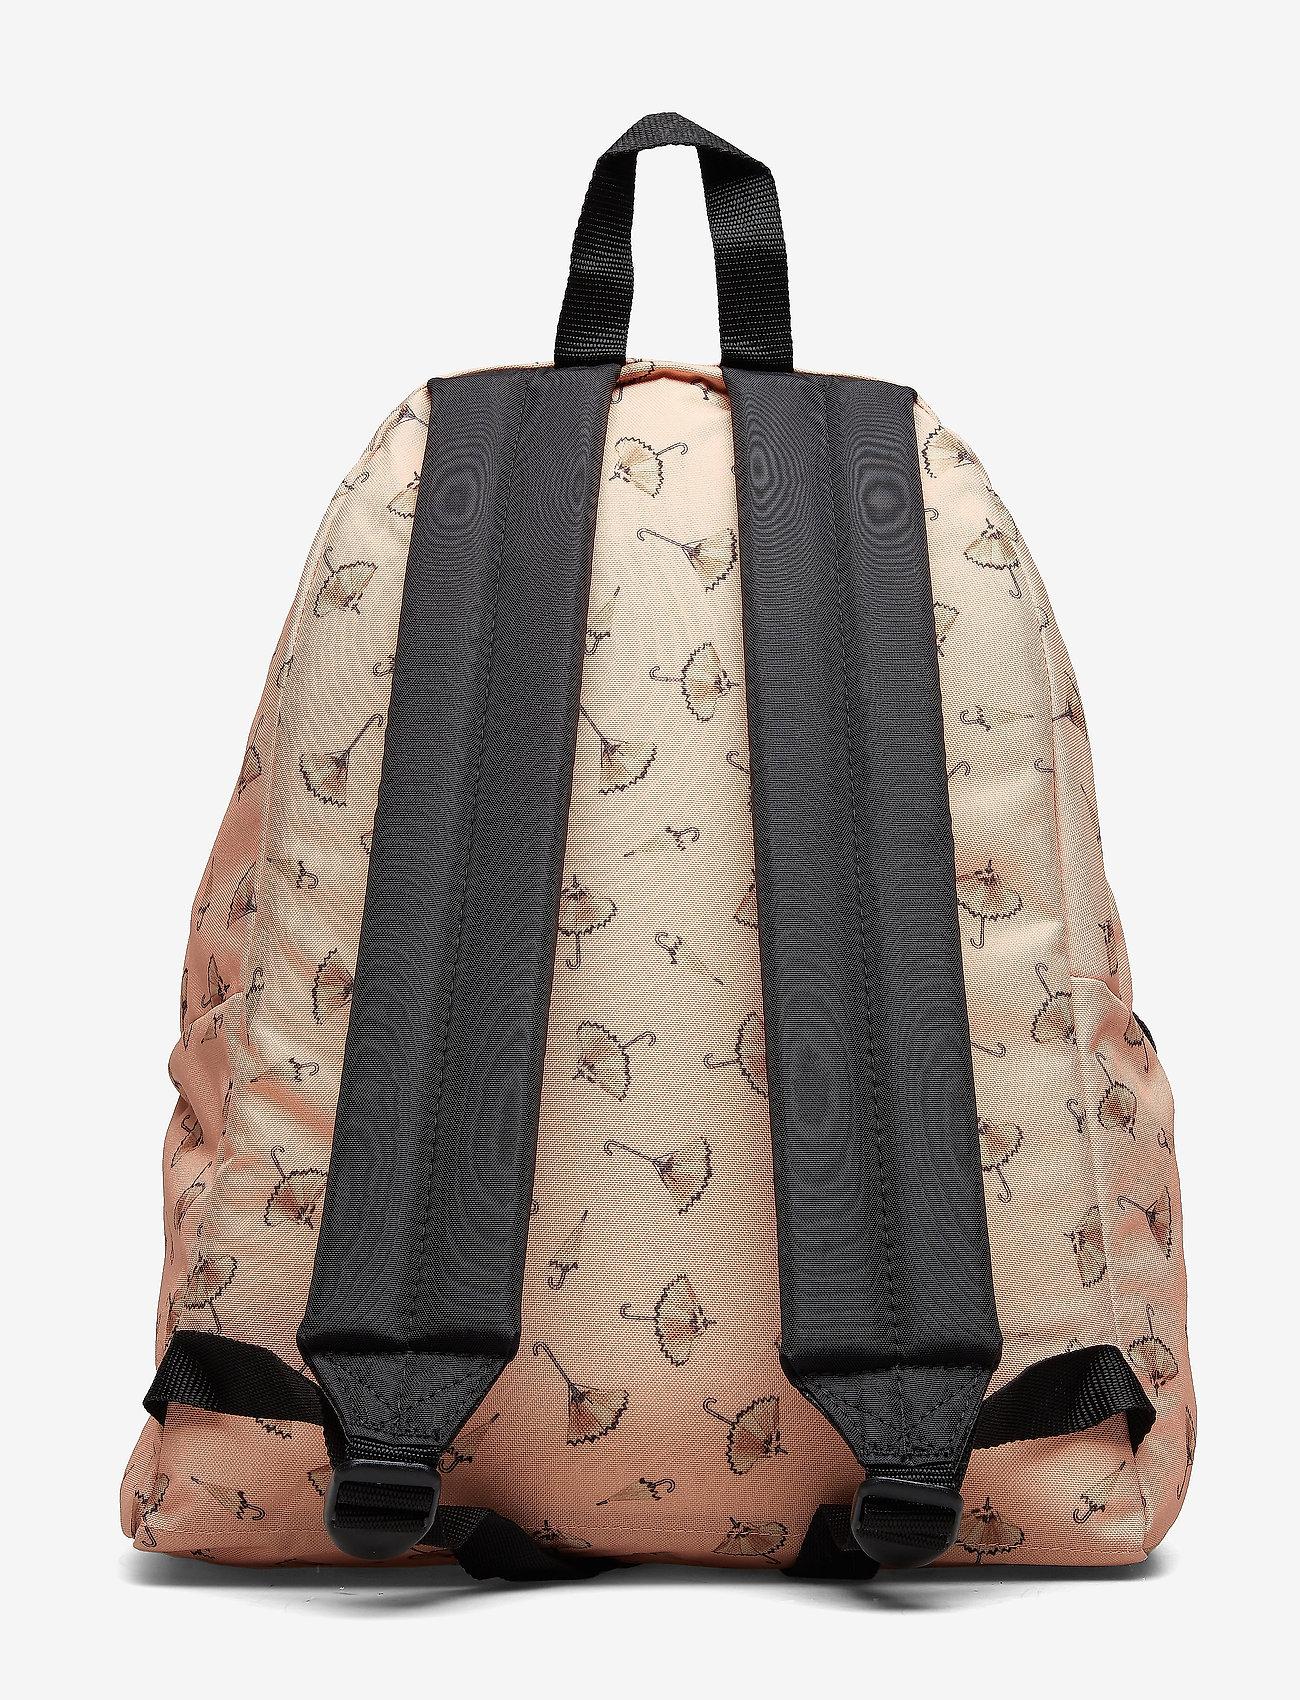 Eastpak - PADDED PAK'R - ryggsäckar - twist umbrella - 1